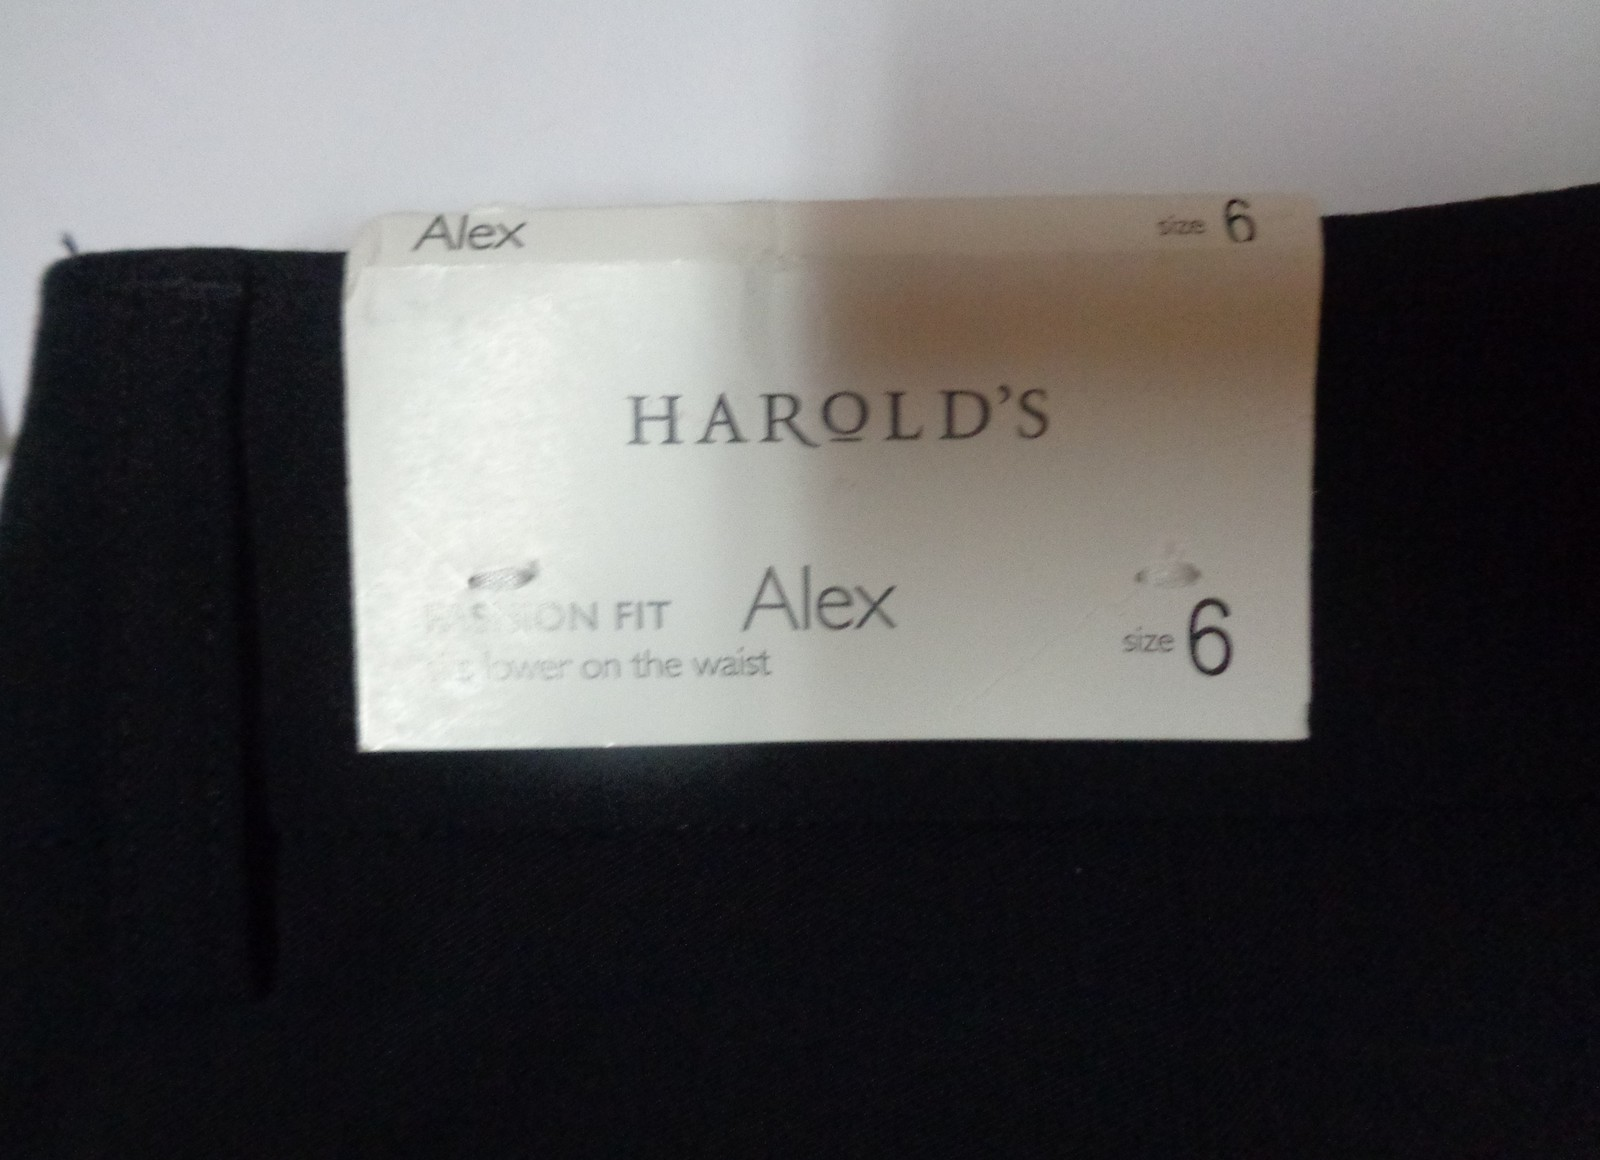 Harold's Alex Shorts Favorite Fit Below Waist NWT Black Women's SZ 6